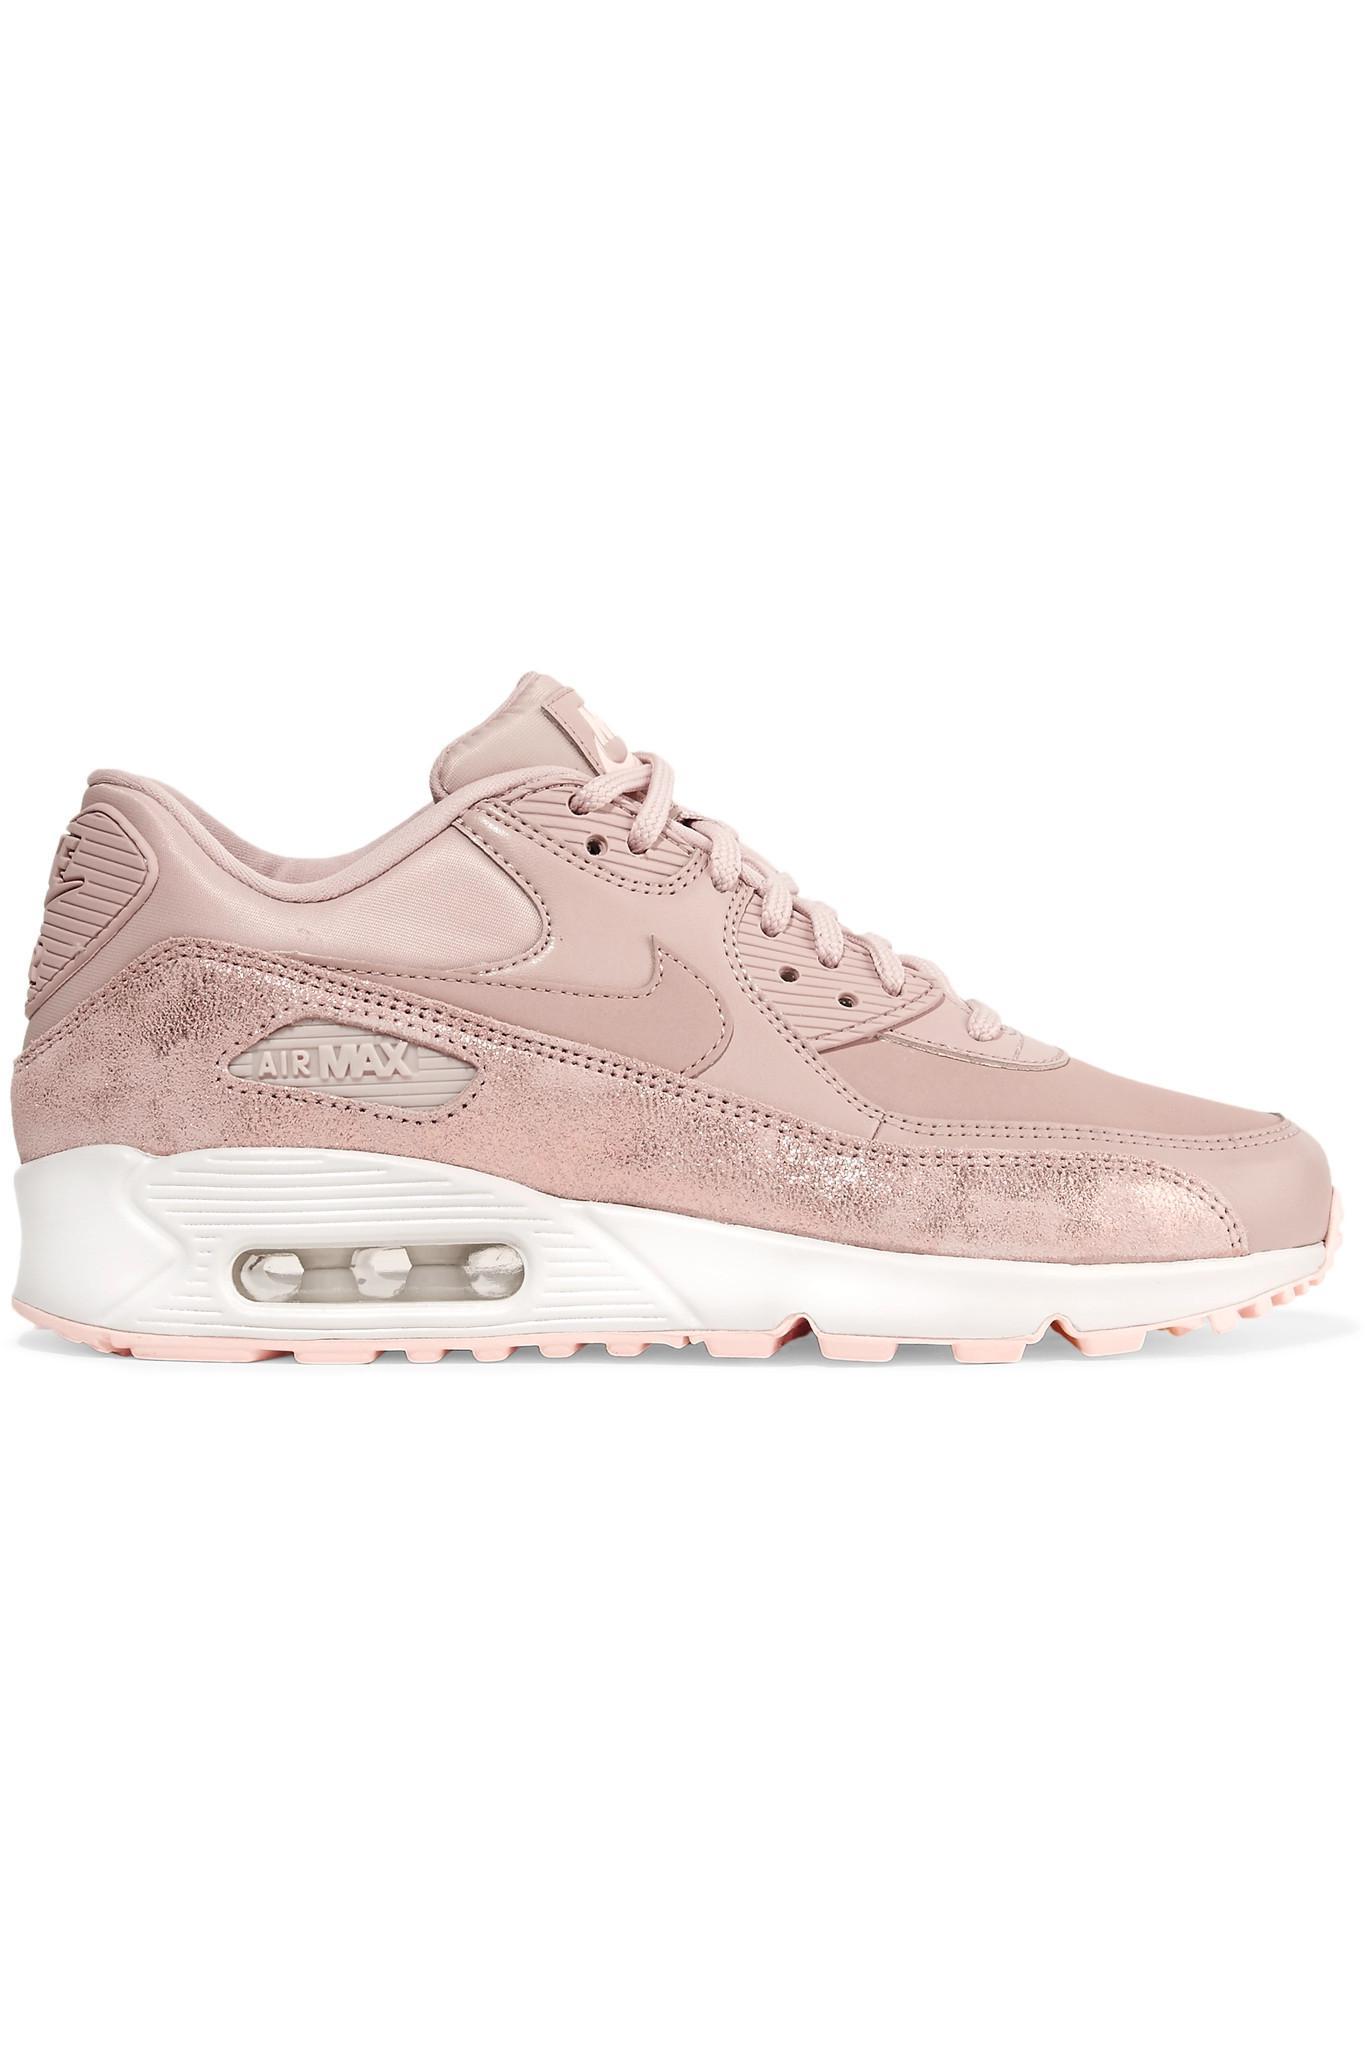 detailing 3e7ce 24b86 Nike. Womens Pink Air Max 90 Premium Cracked ...